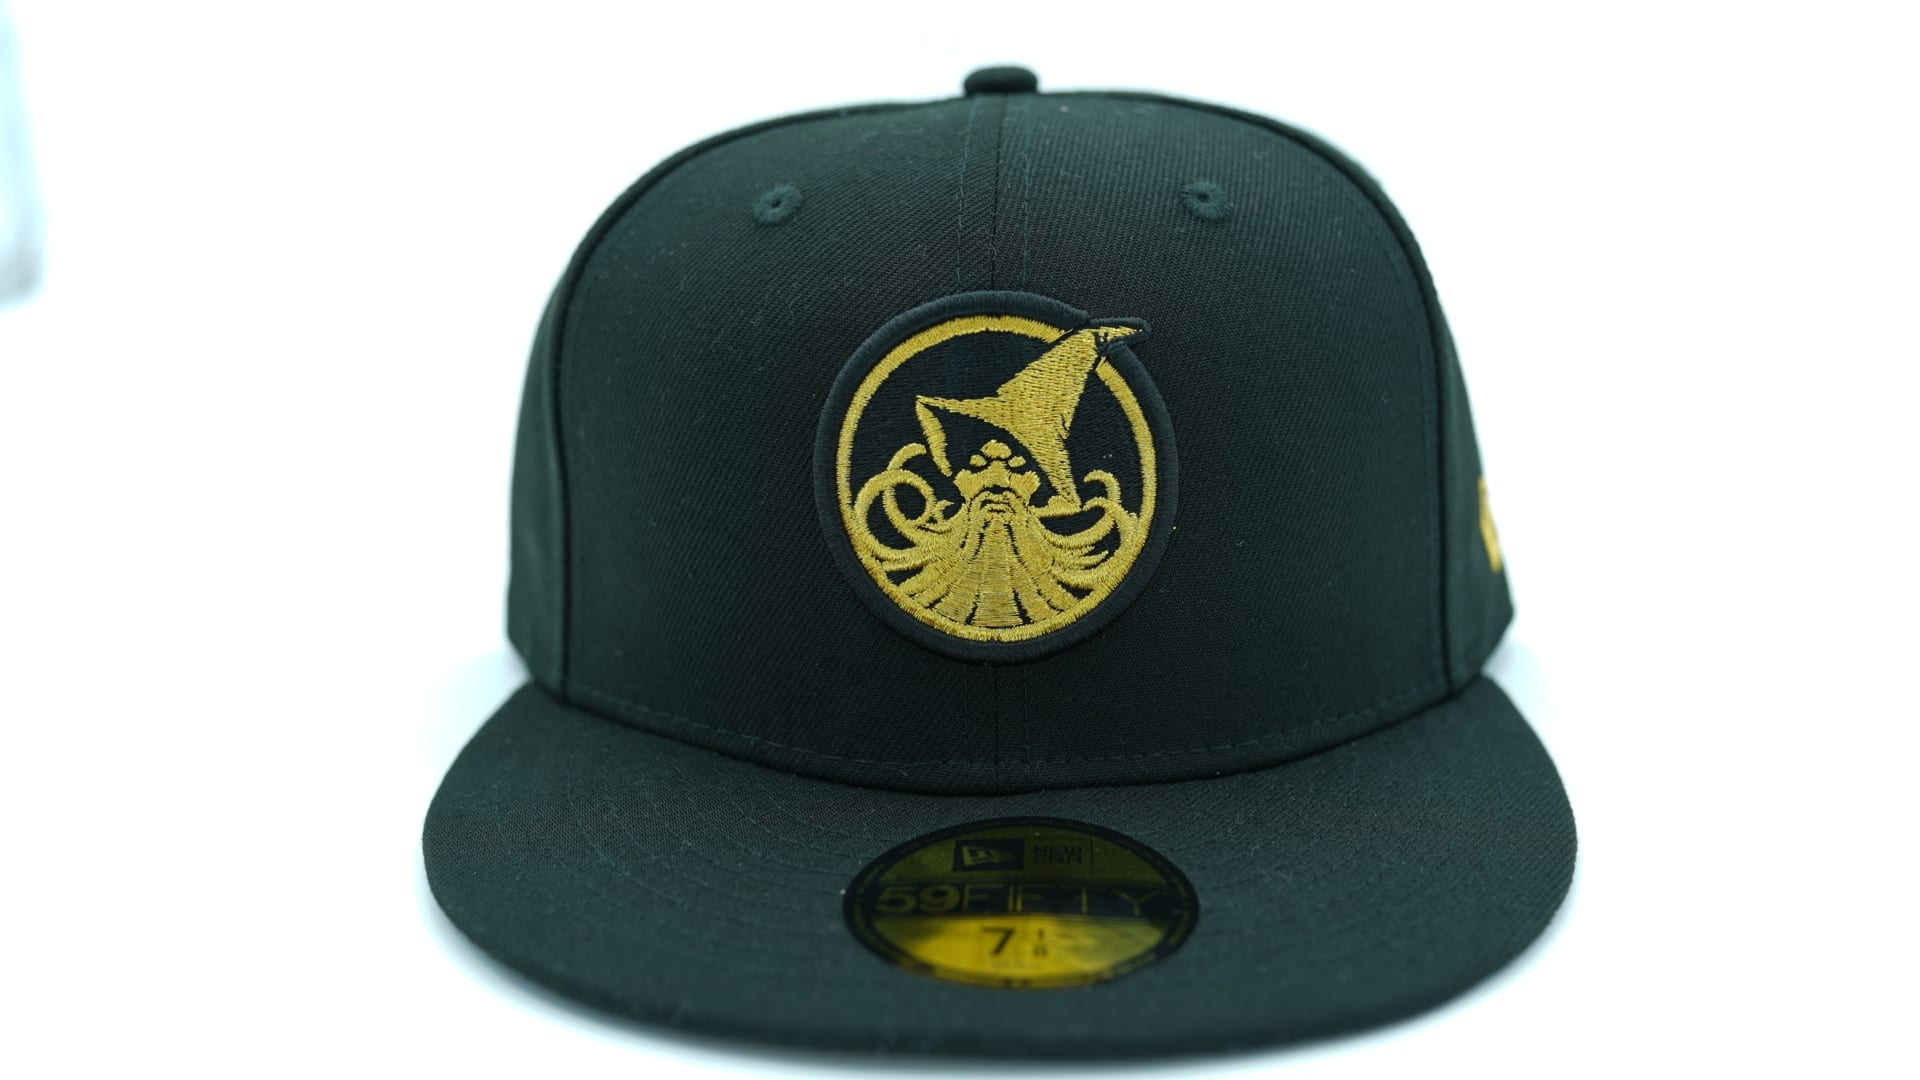 3aa23f9f26e68 final round rockstar 59fifty fitted baseball cap rockstar energy new era 1